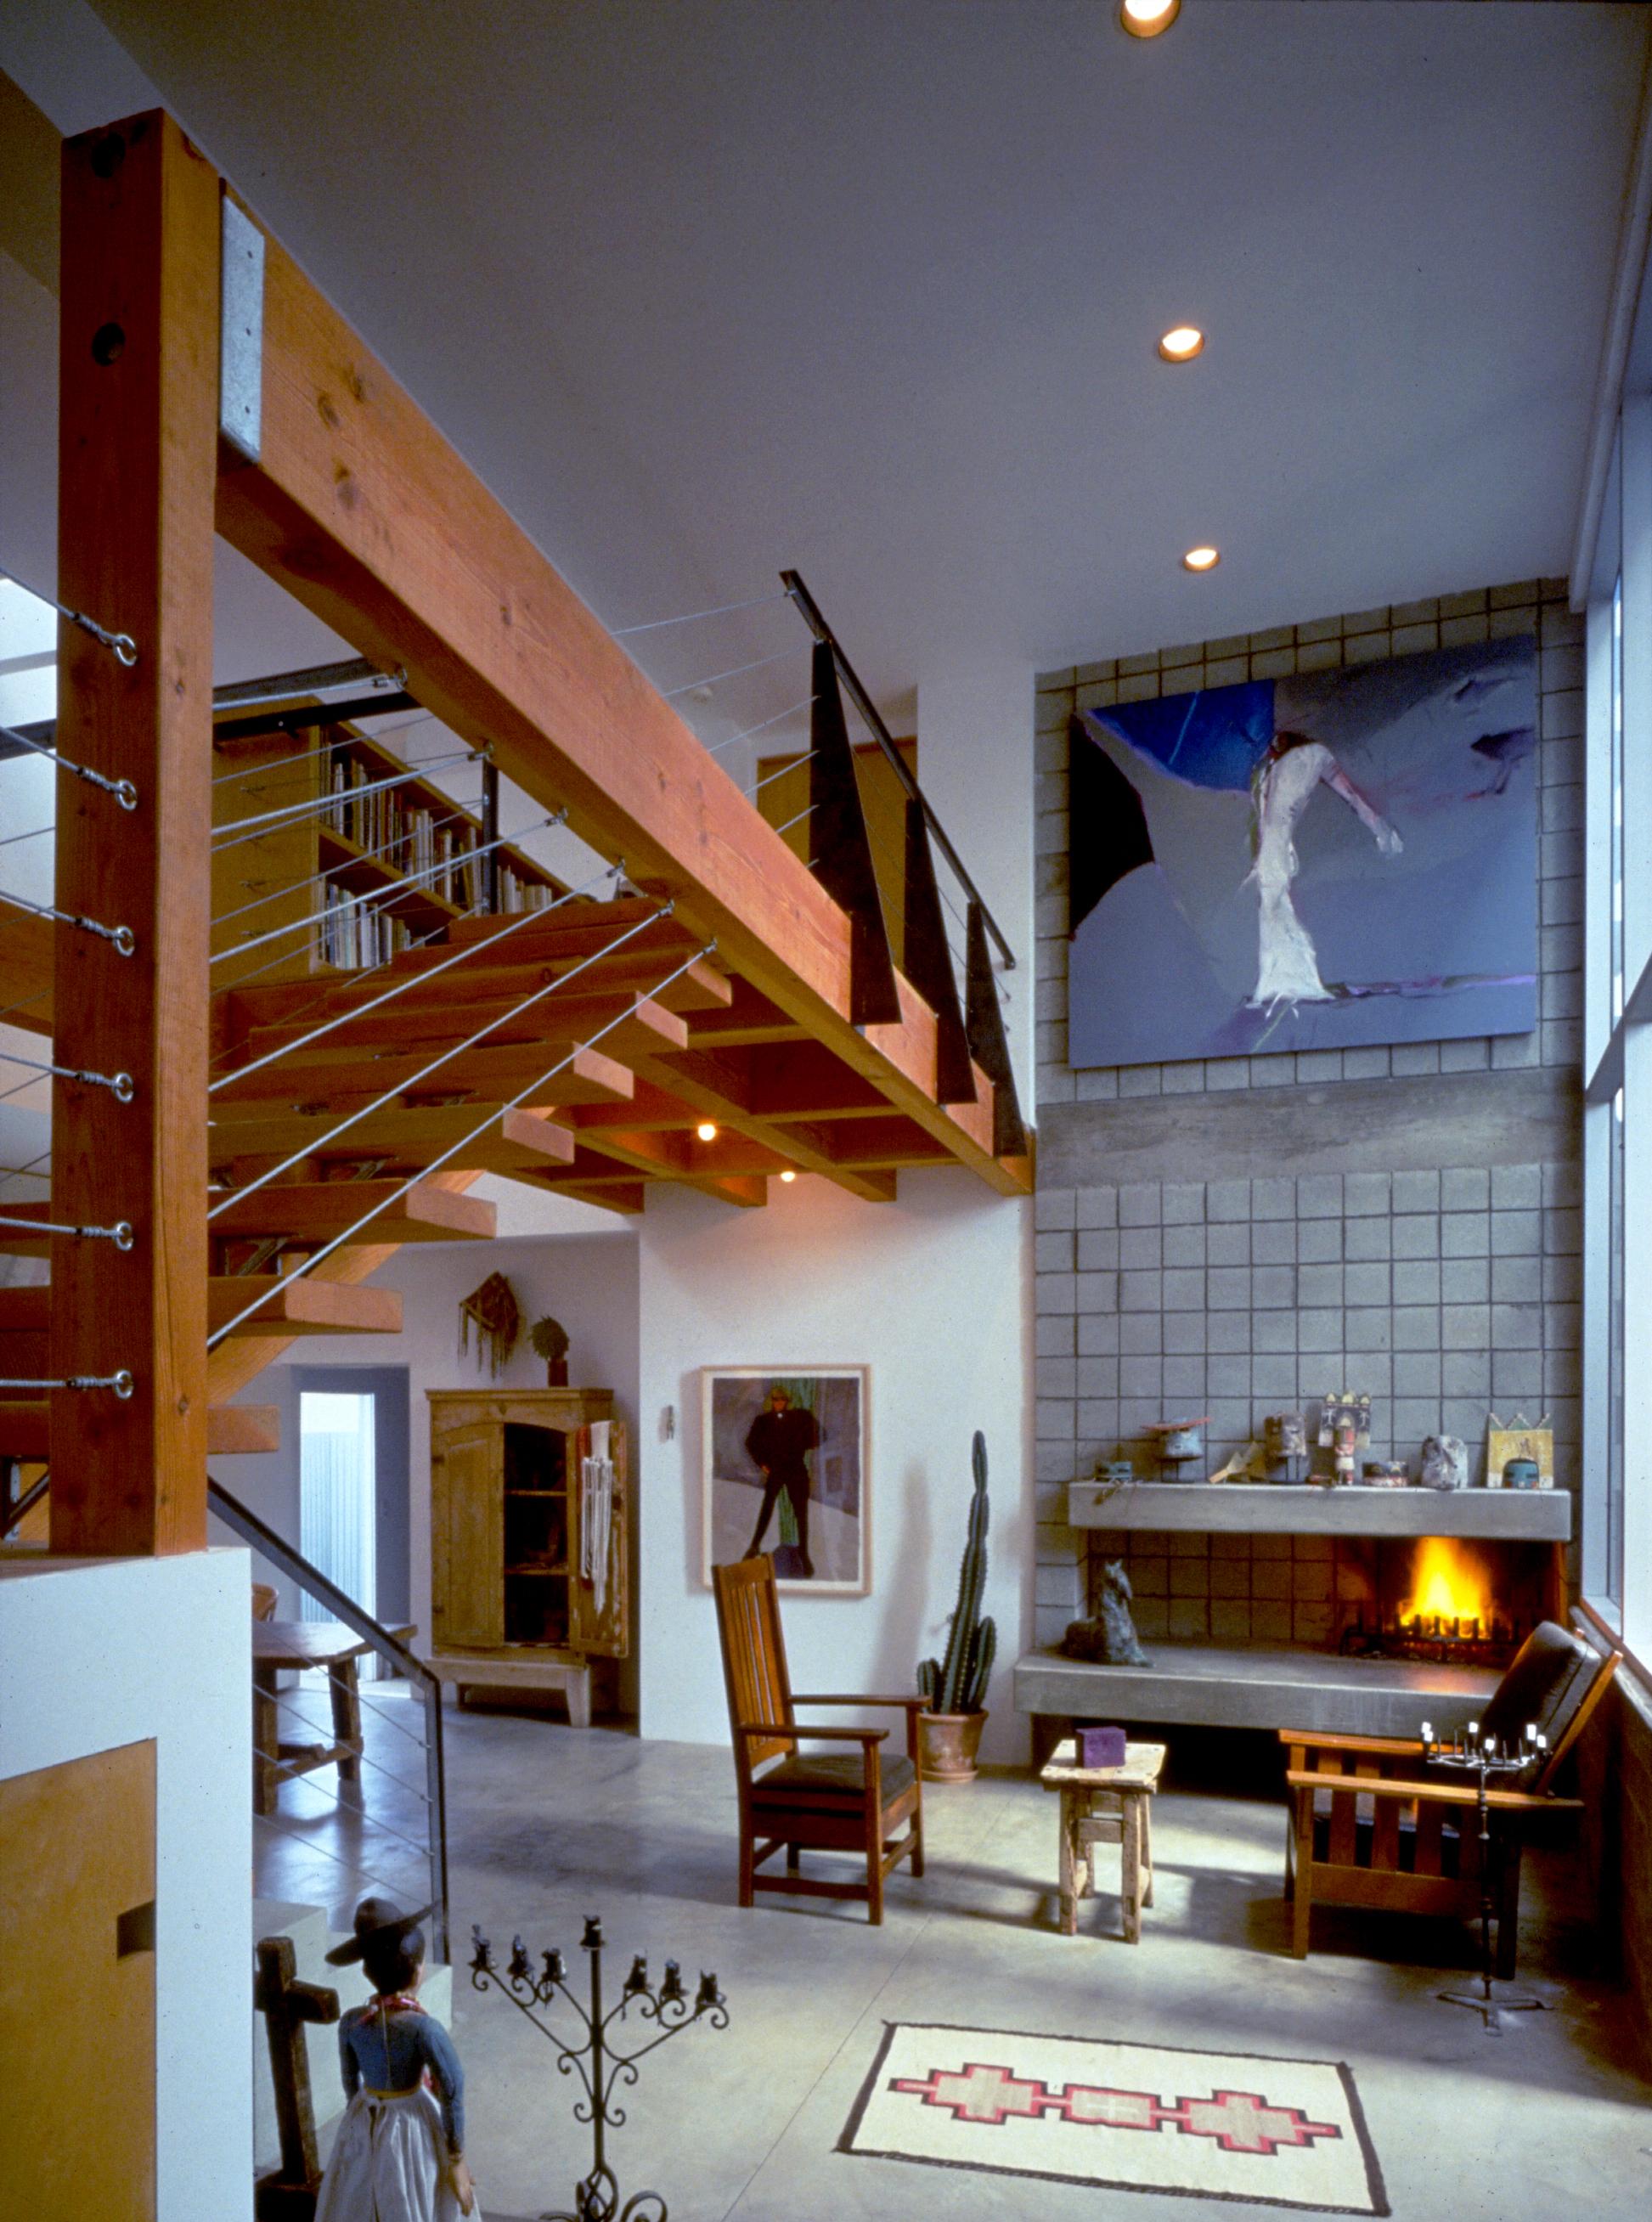 S.E.A.-Studio-Environmental-Architecture-David-Hertz-FAIA-Venable-House-Venice-Beach-sustainable-regenerative-restorative-design-residential-contemporary-modern-passive-systems-recycled-wood-concrete-green-building-canal-beachhouse-studioea-8.jpg